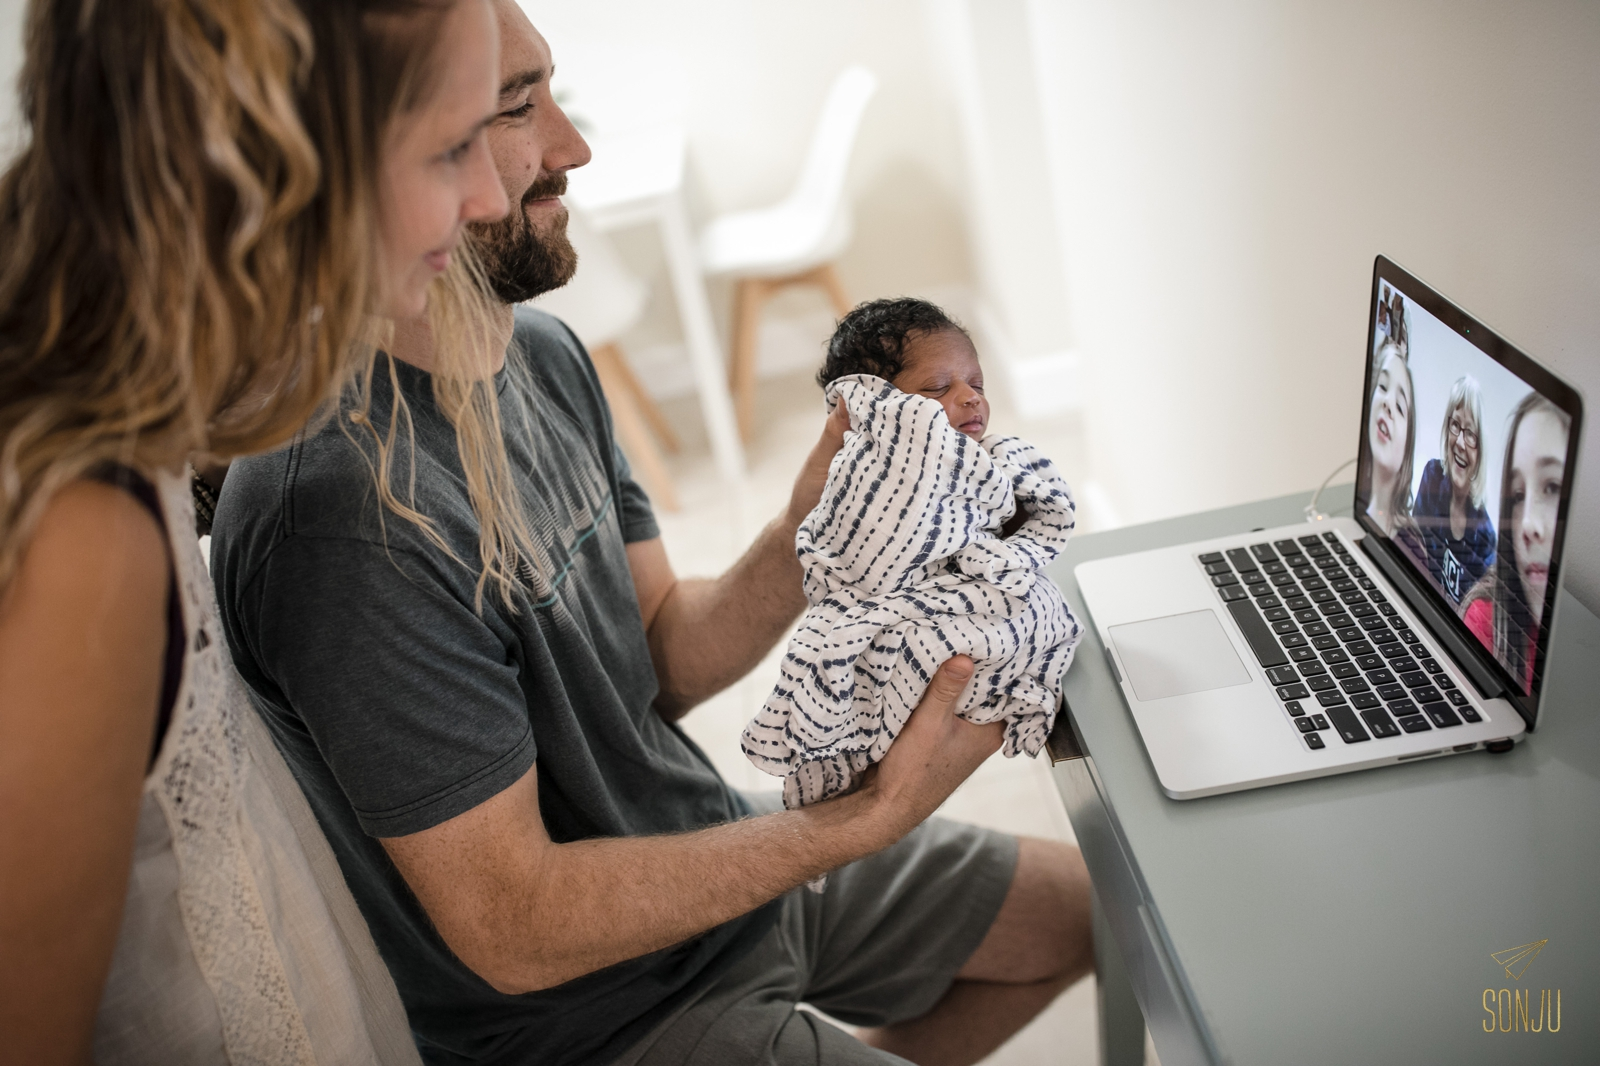 fort-lauderdale-adoption-photographer-family